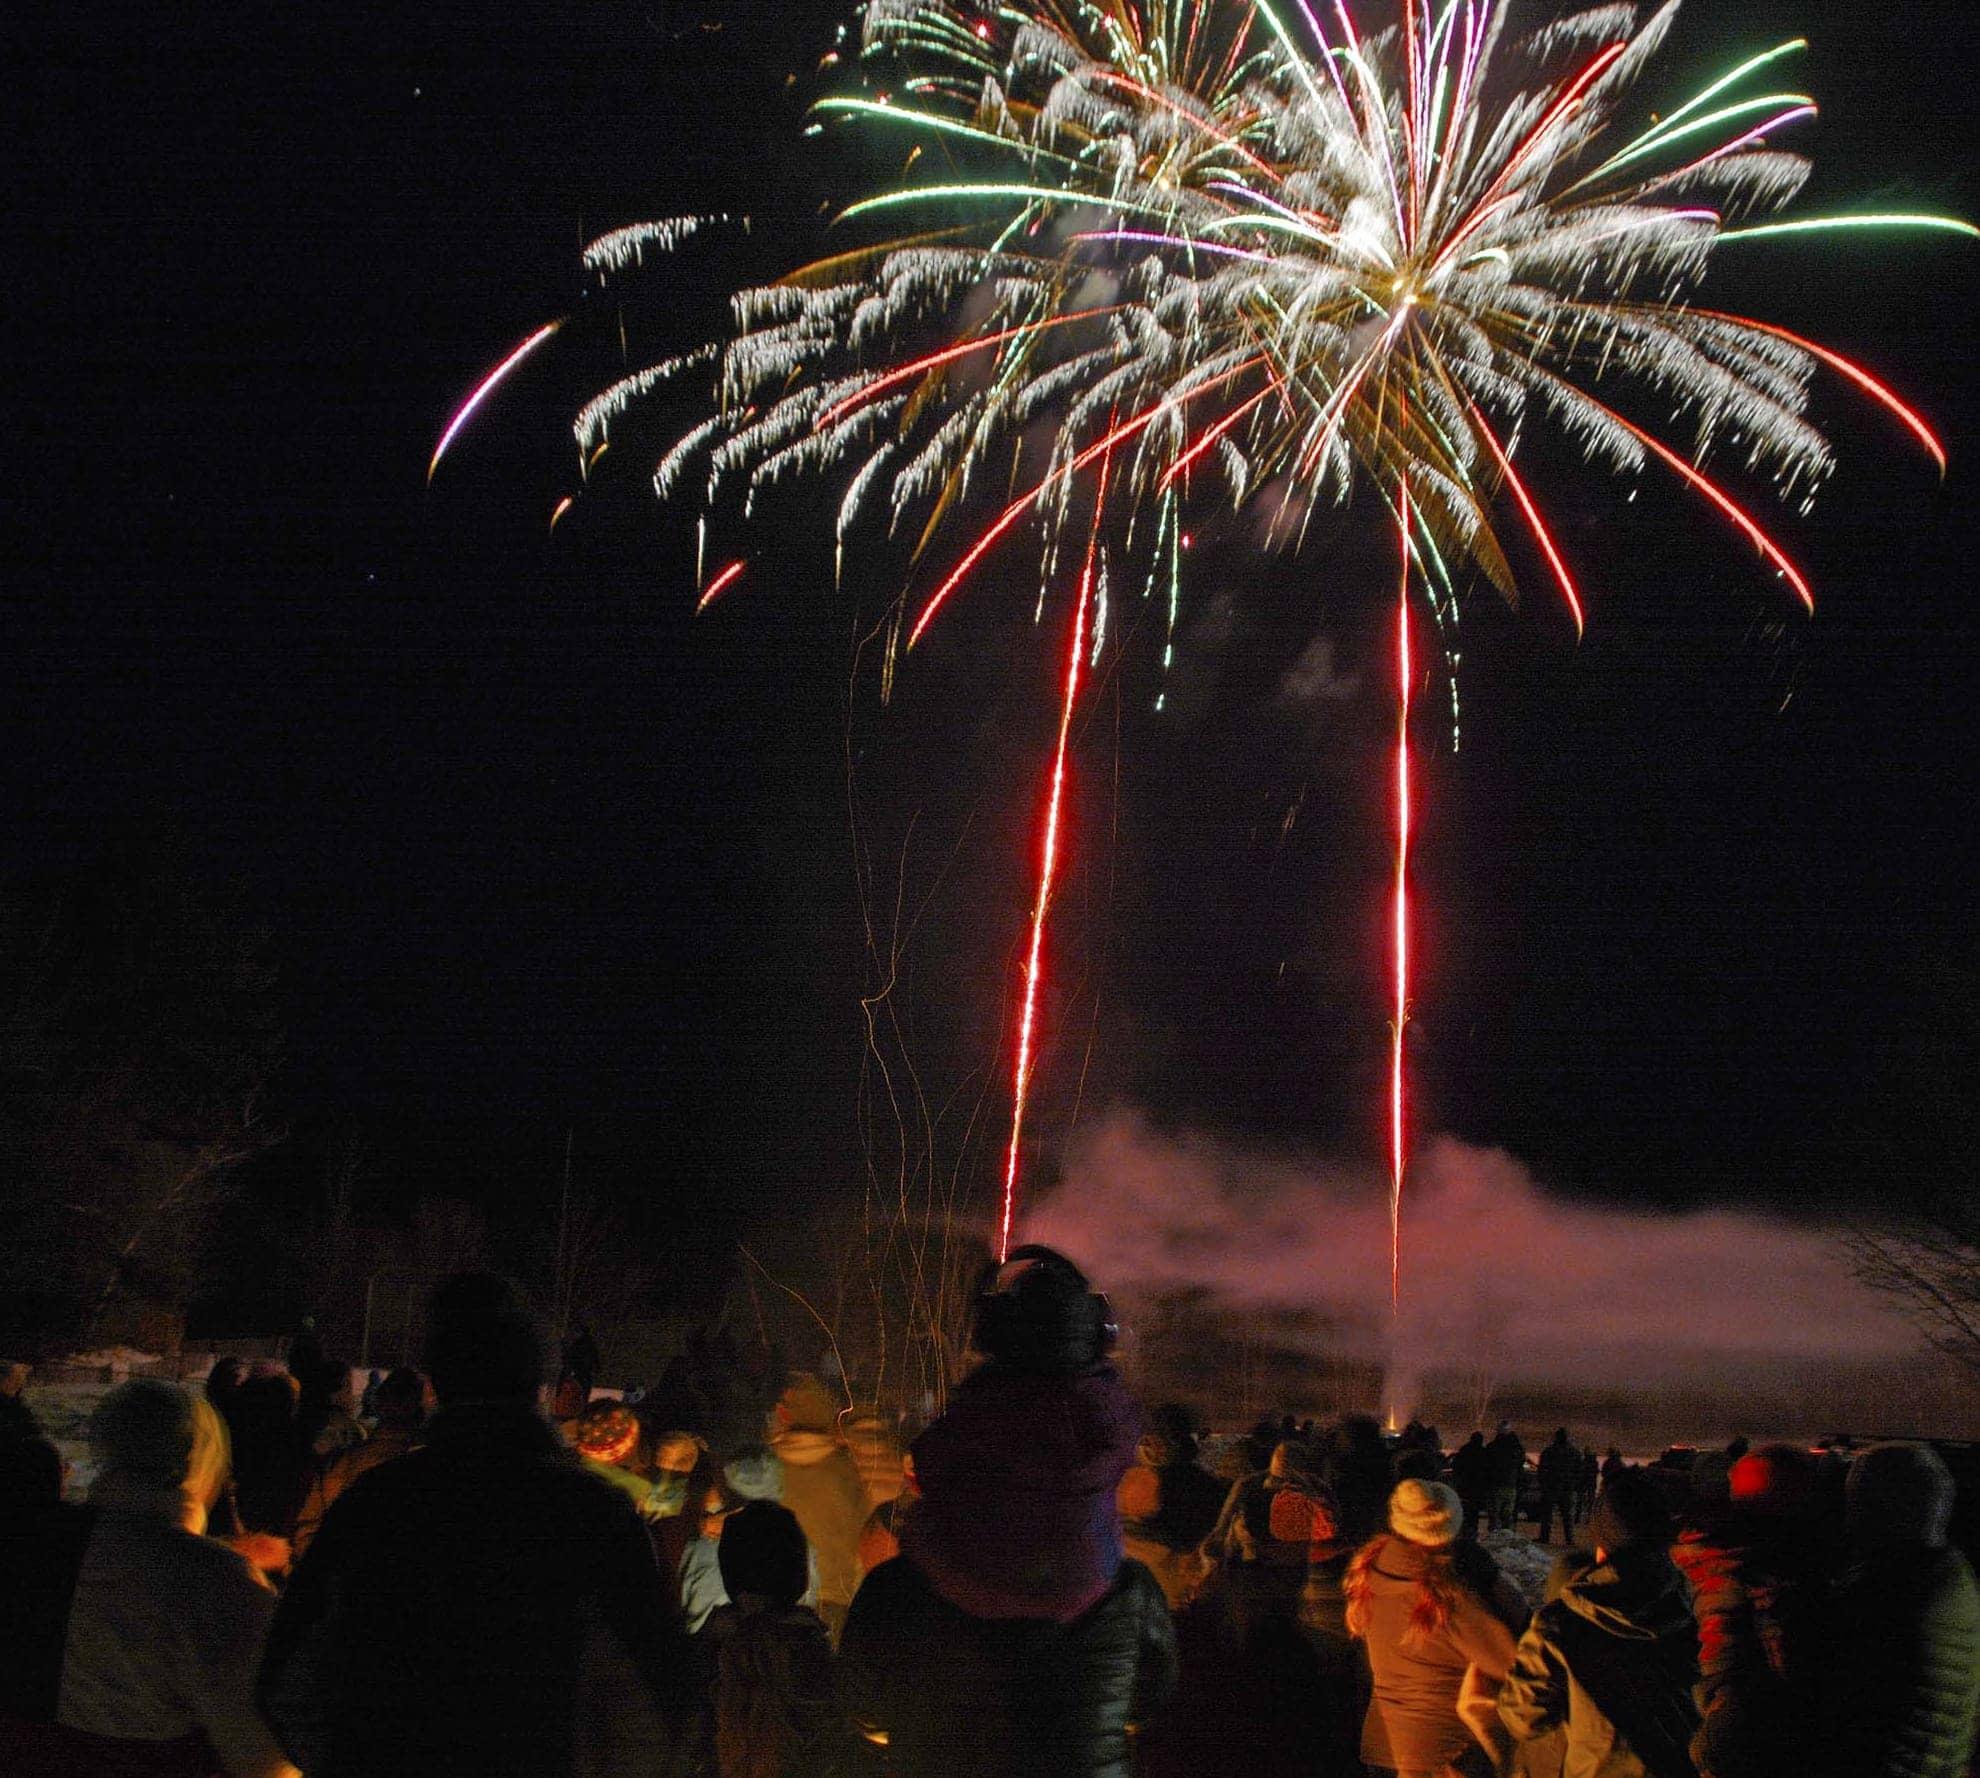 NL-winter-carneval-fireworks-w2218-w1980.jpg